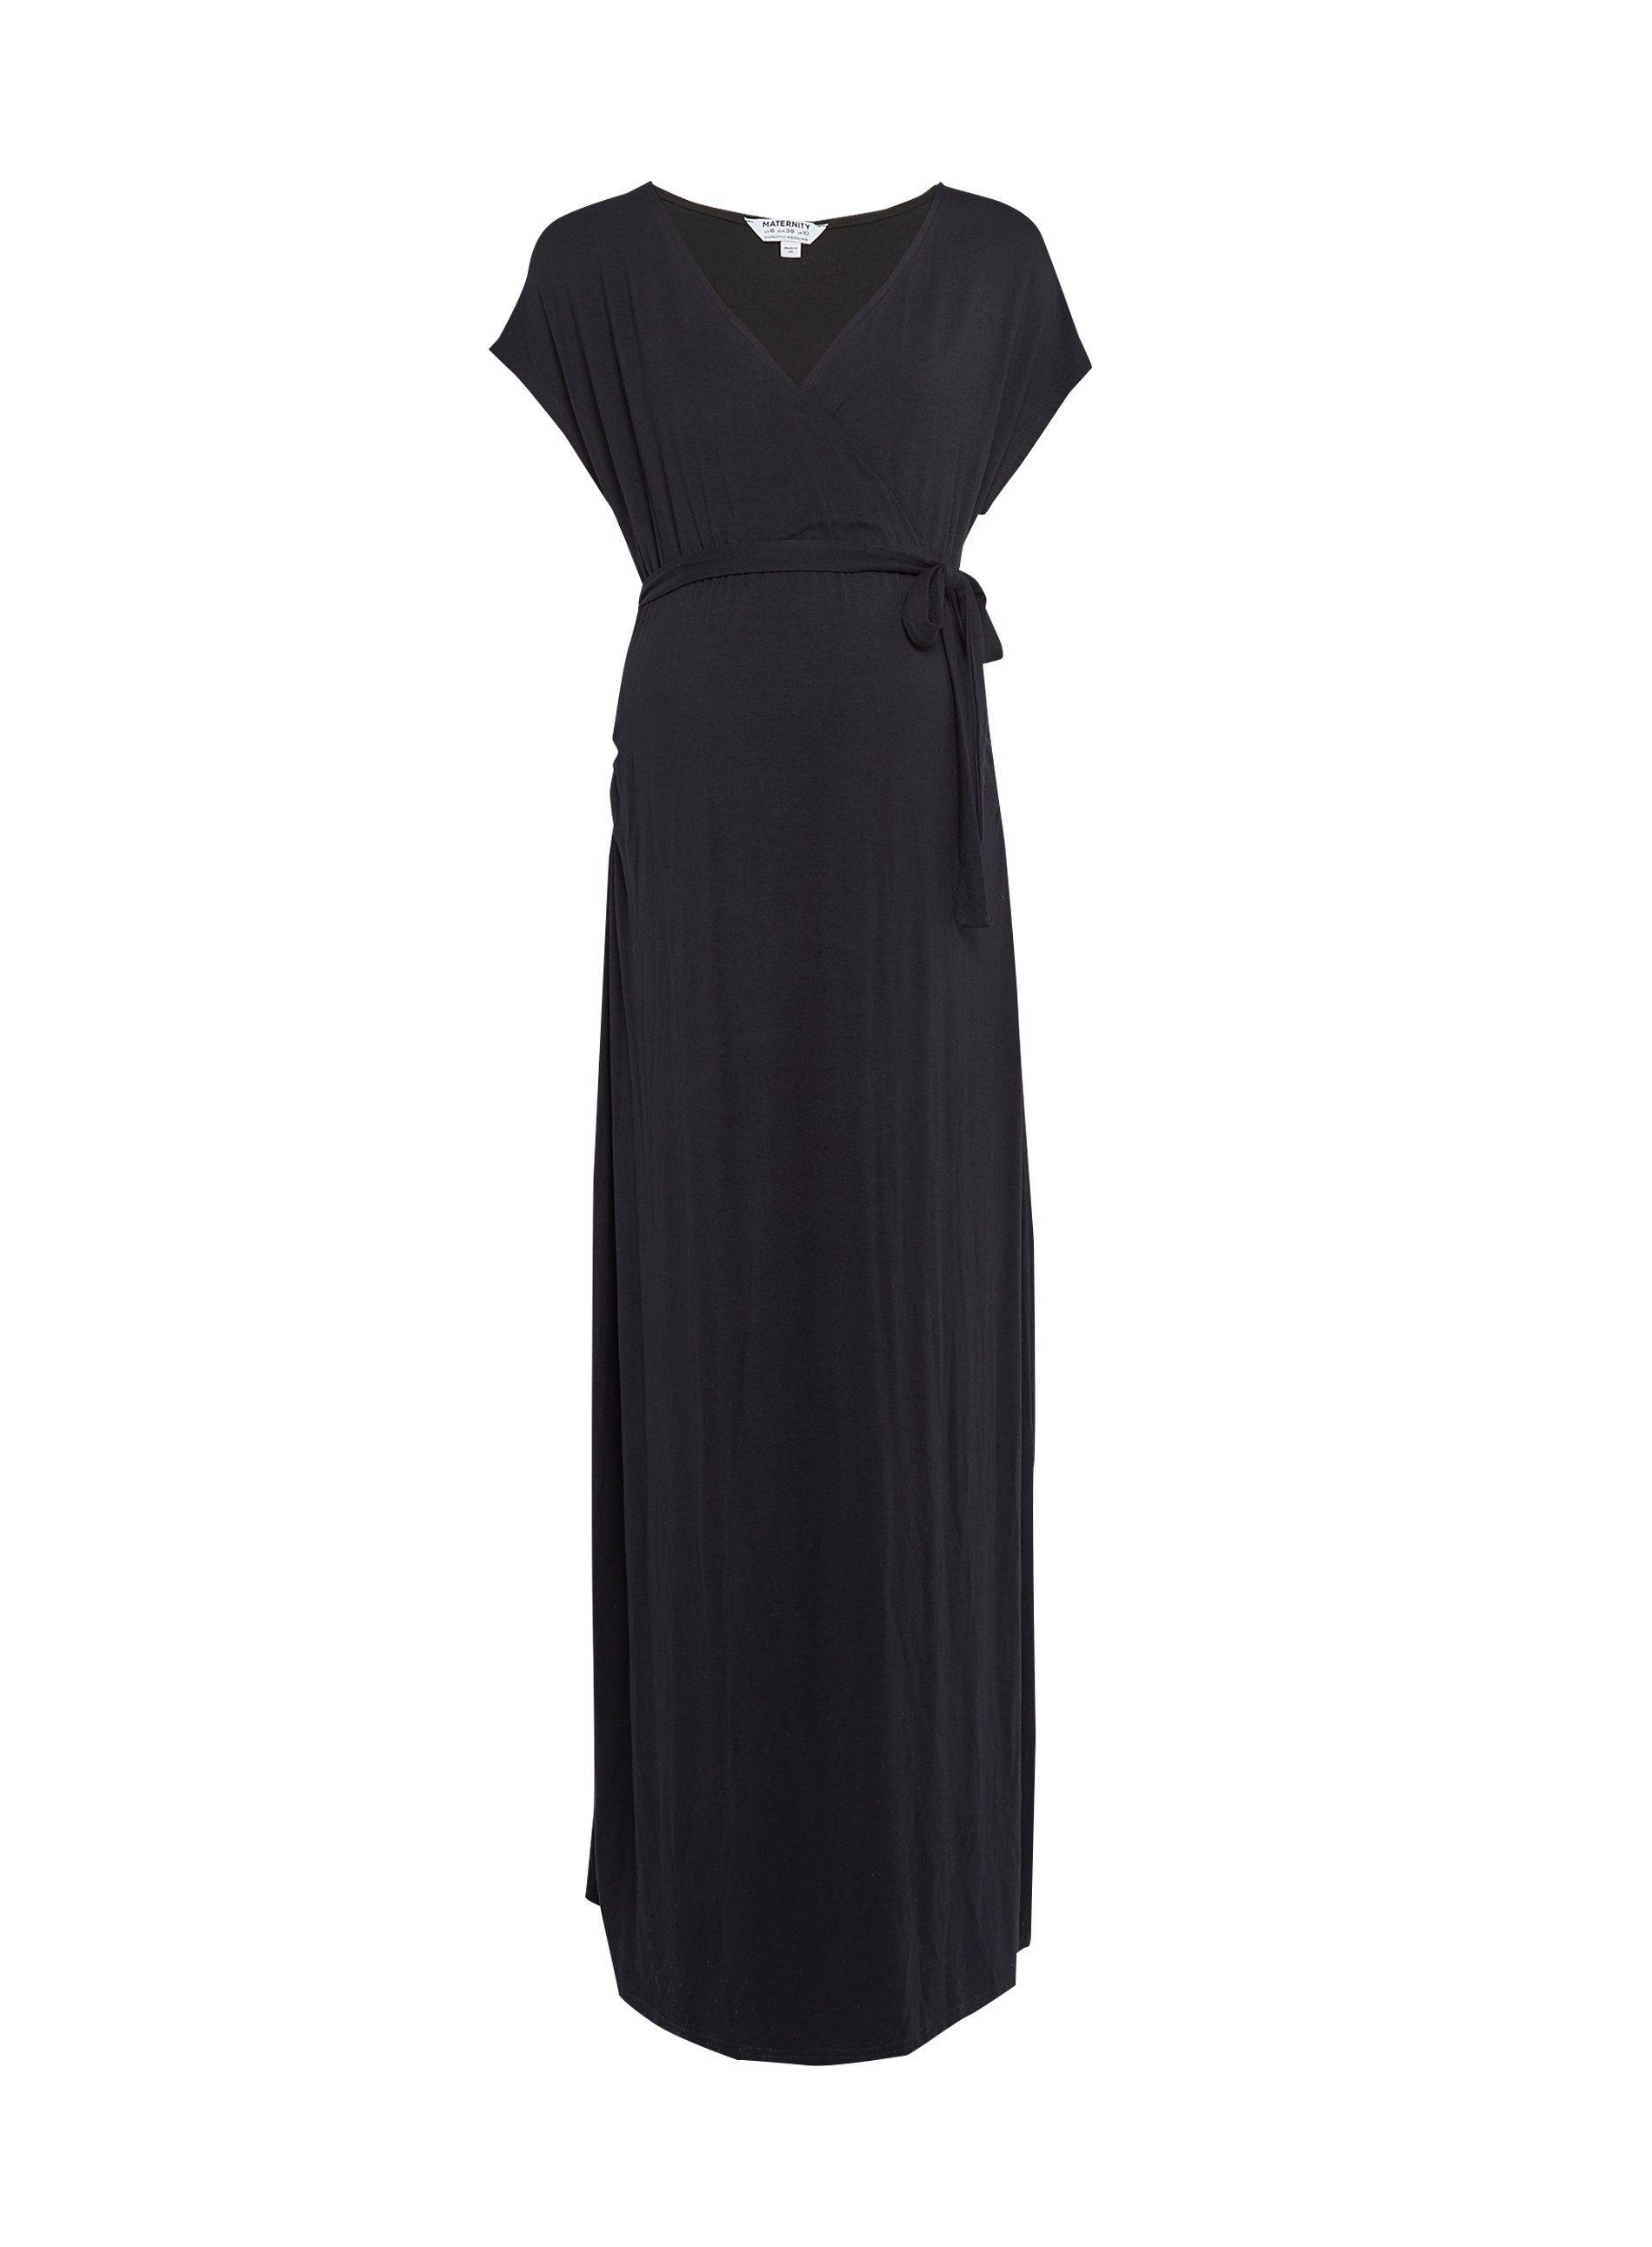 Dorothy Perkins Womens Maternity Black Wrap Maxi Dress V-Neck Short Sleeve